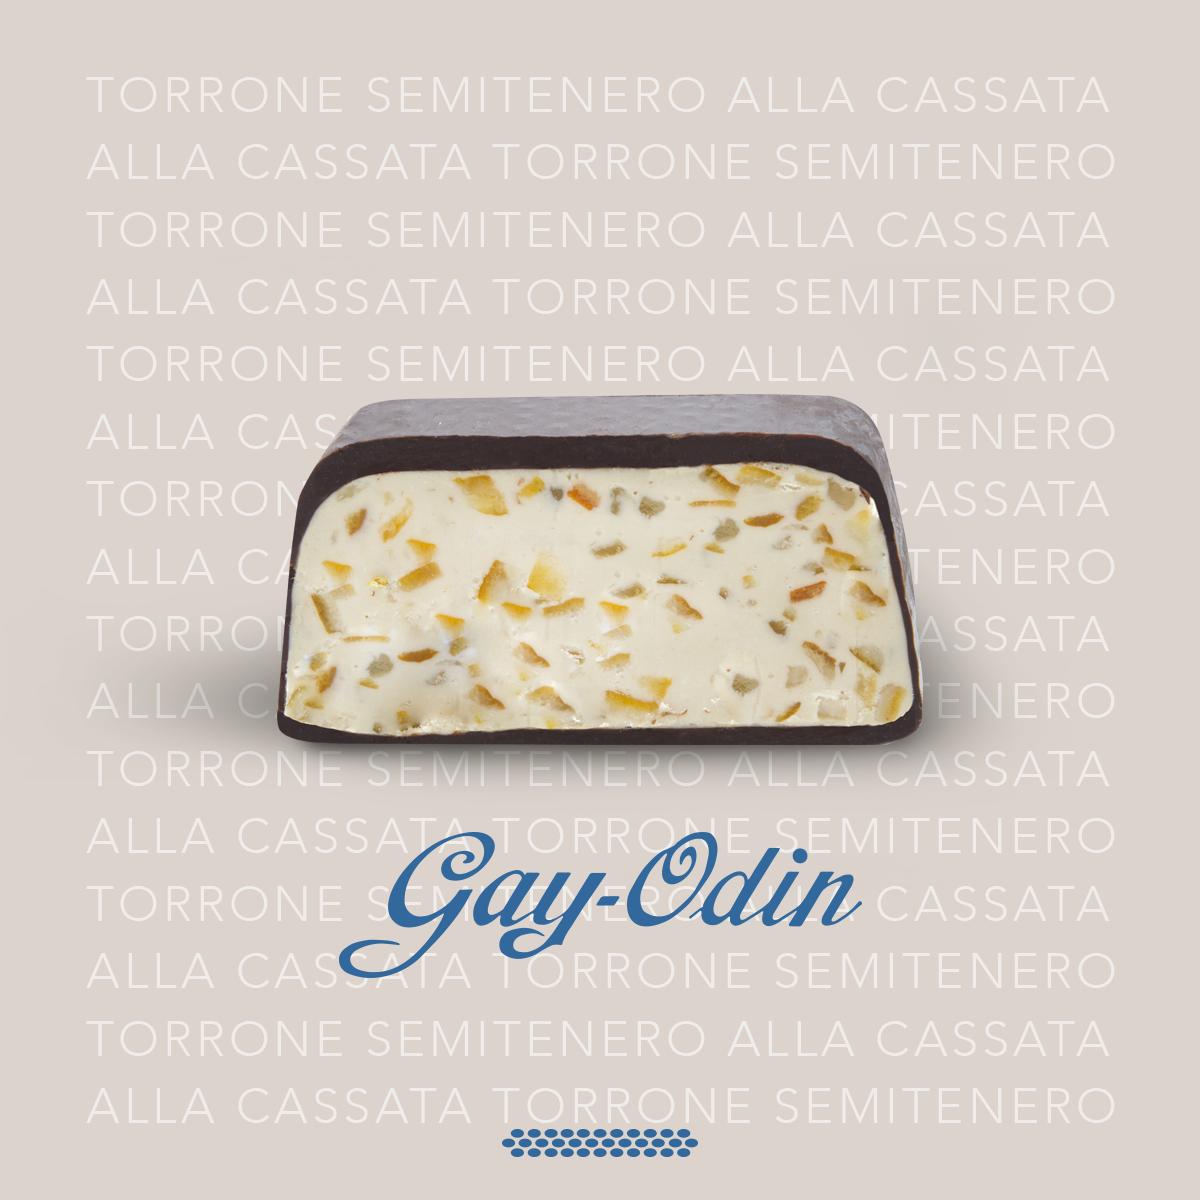 Gay-Odin_torrone5